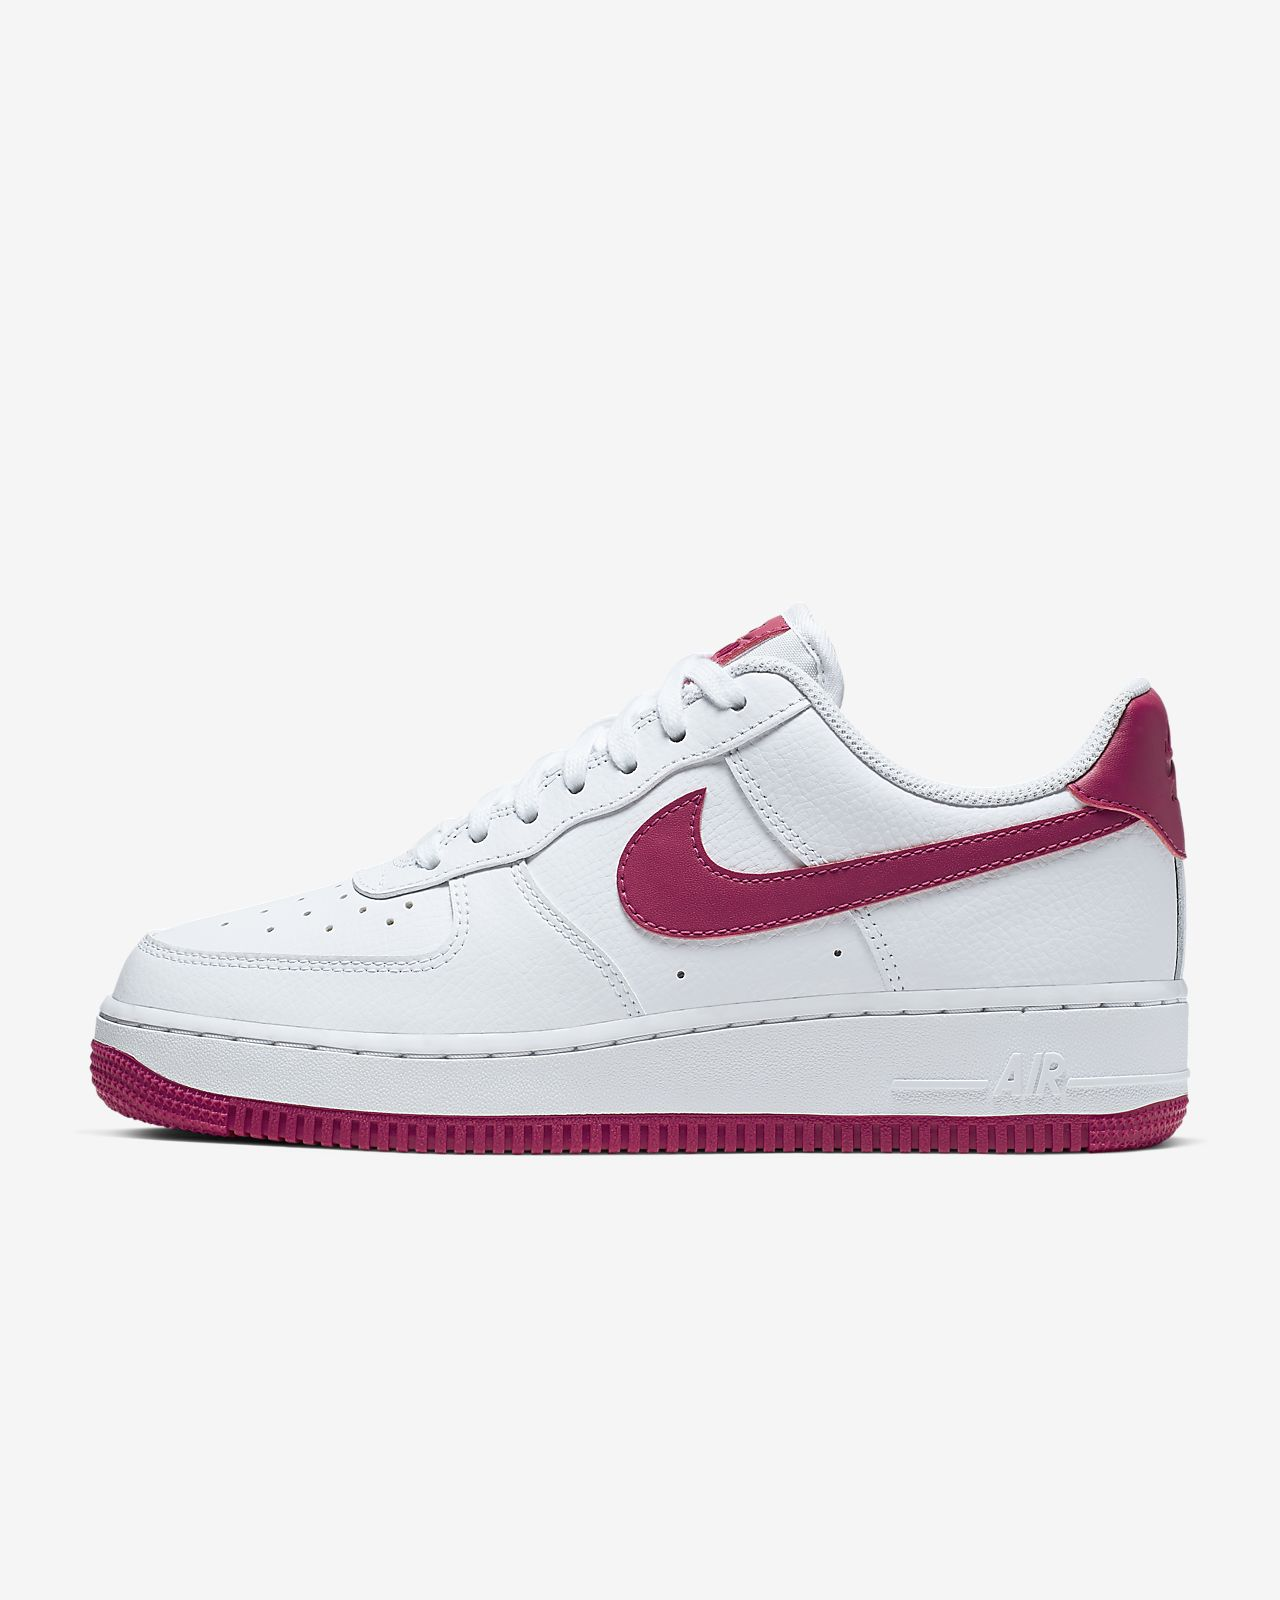 Nike Air Force 1 '07 Patent Damenschuh